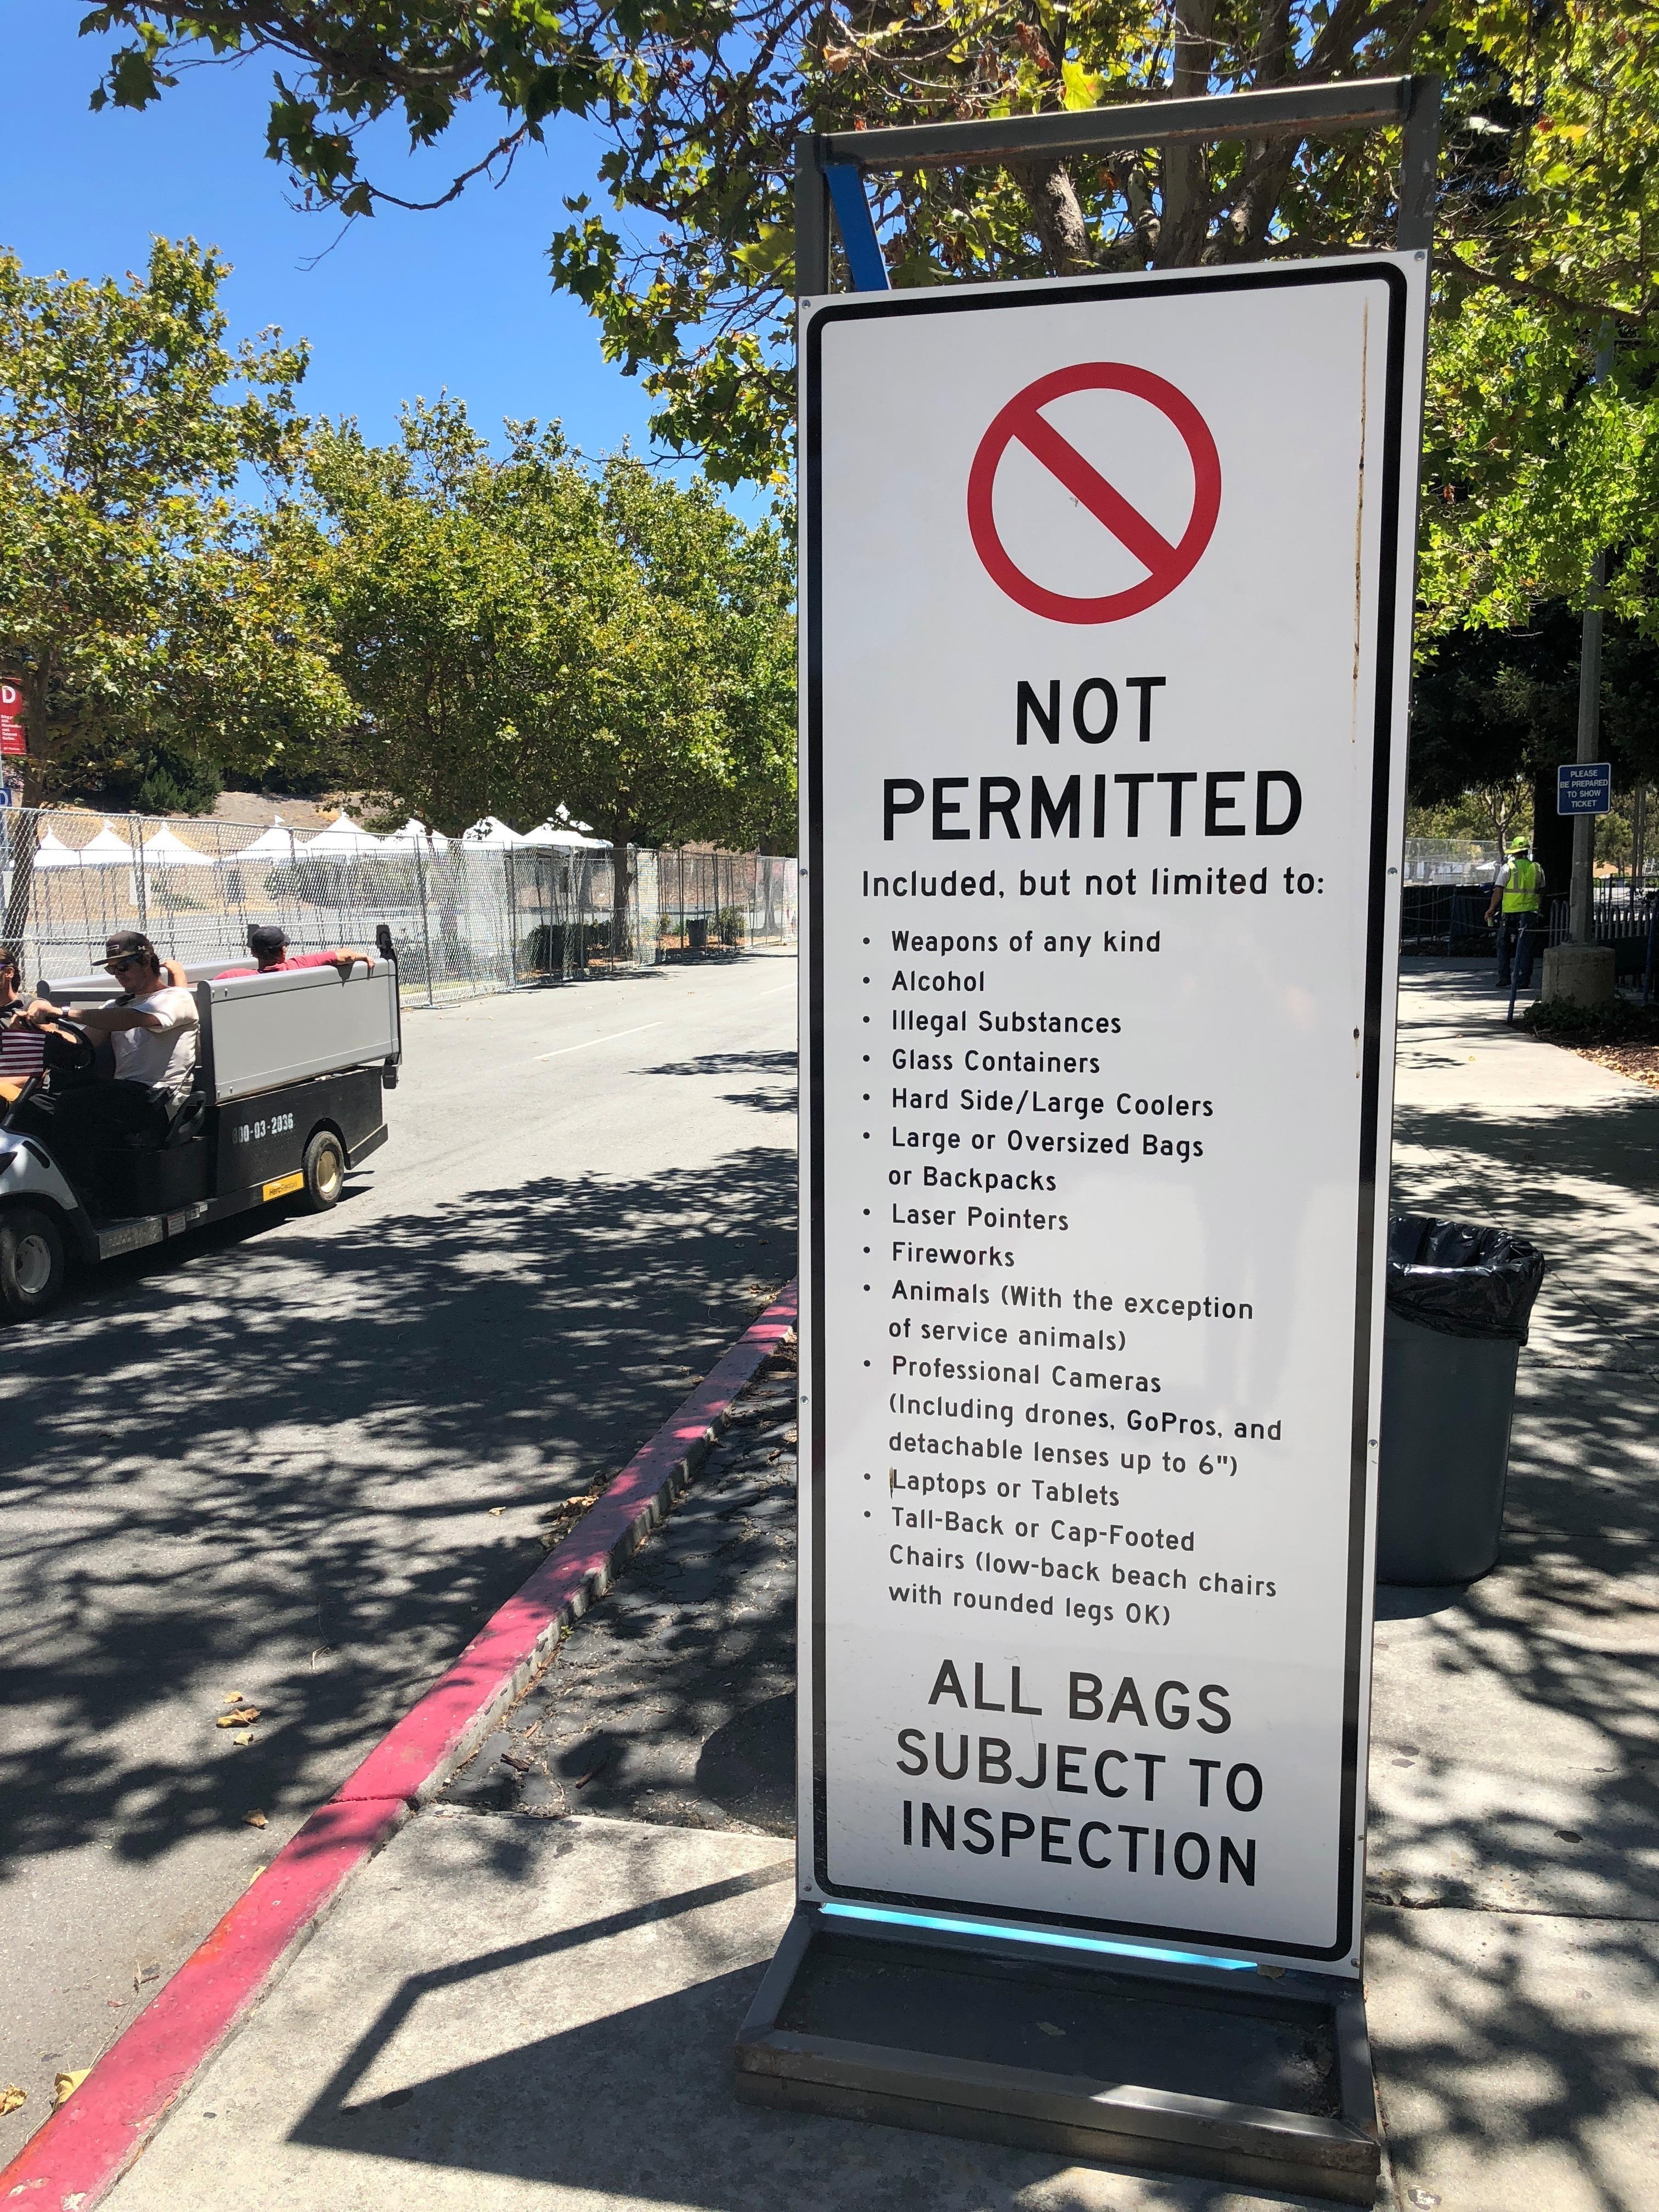 Shoreline Amphitheatre入場處外標示牌上明文寫著禁止攜帶酒精、武器與其他任何非法的物品。(記者林亞歆/攝影)